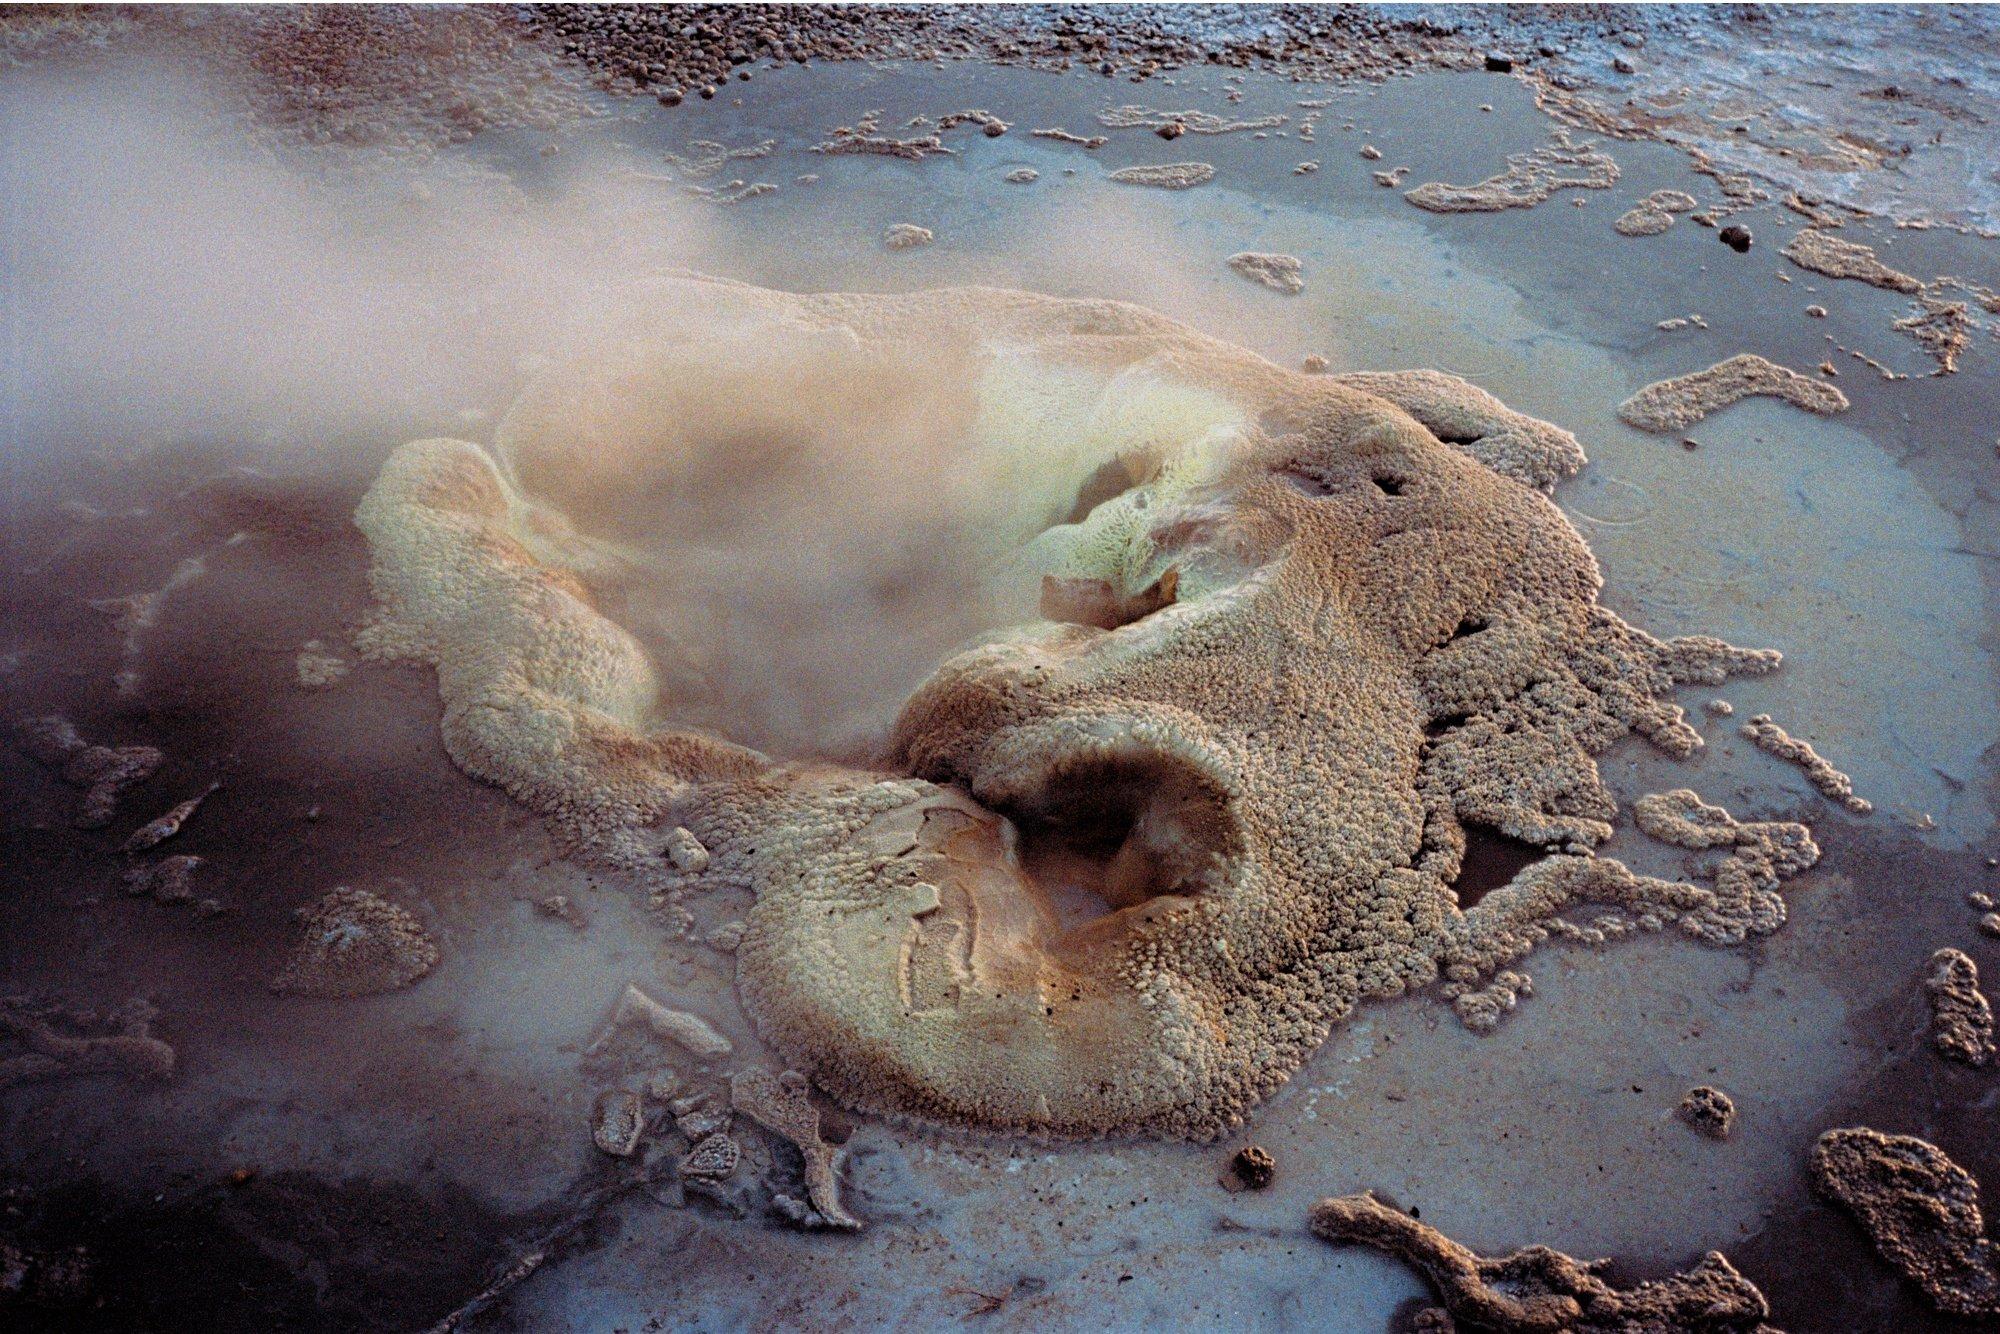 Leonardo Scotti Tells Colorful Stories Through The Aesthetic Of Film Photography - IGNANT